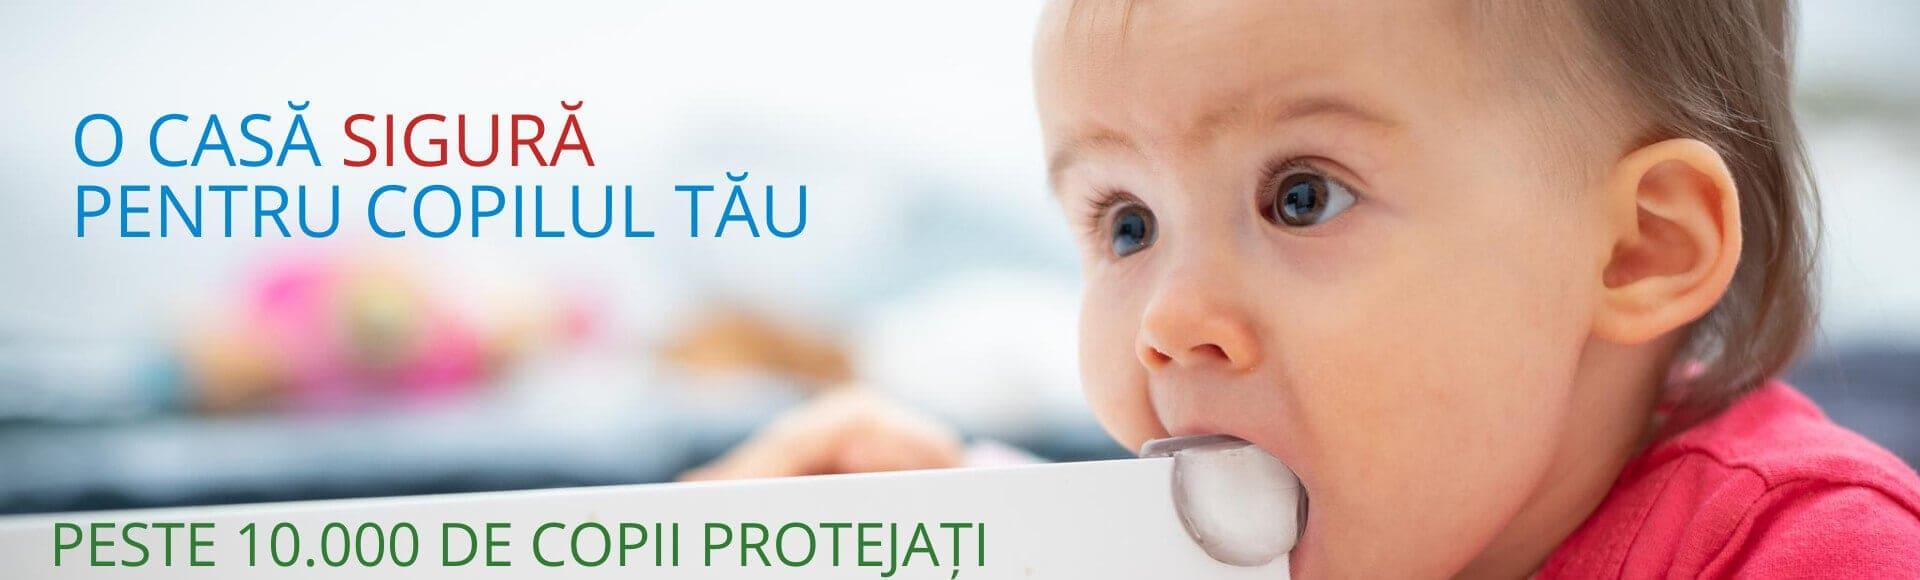 Articole siguranta copii si bebelusi